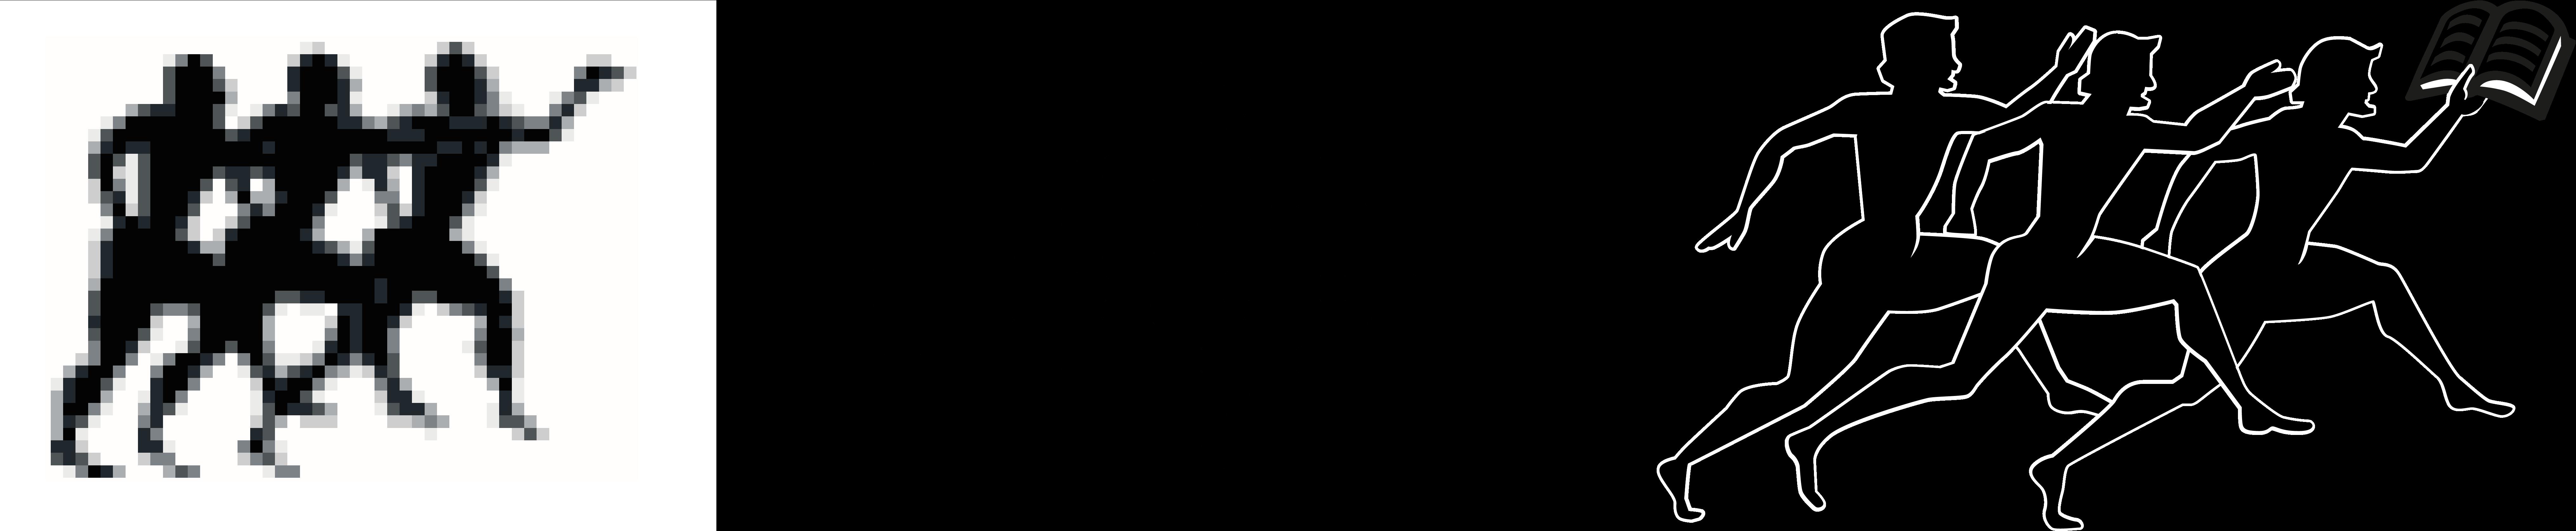 Doc's Com Verlag - Abbildung Transformation Läufergruppe mit angepassten Pfeil